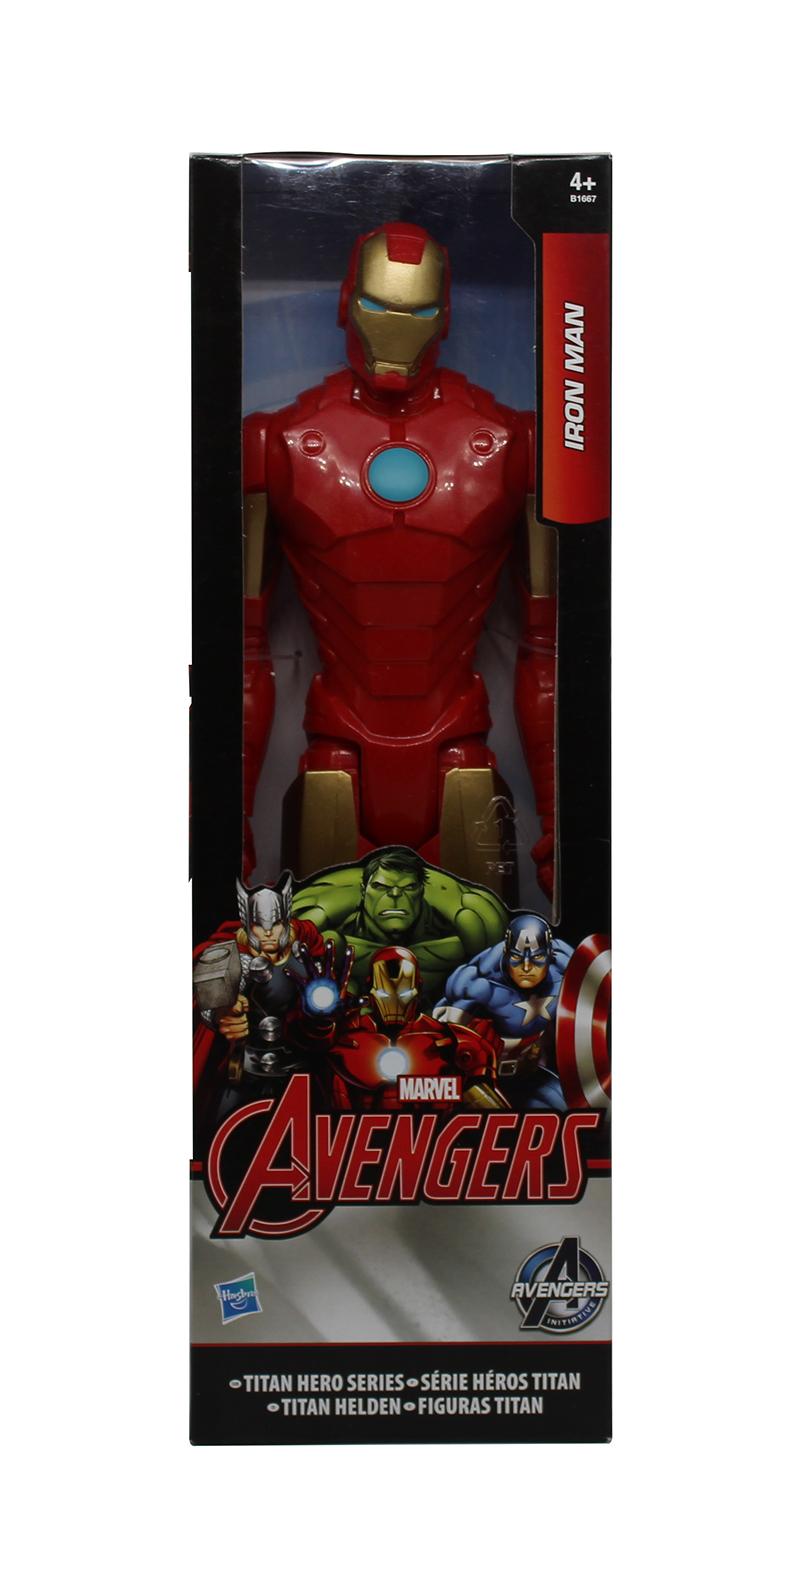 Marvel B1667 Avengers Iron-Man Spielfigur Titan Hero Serie 30cm